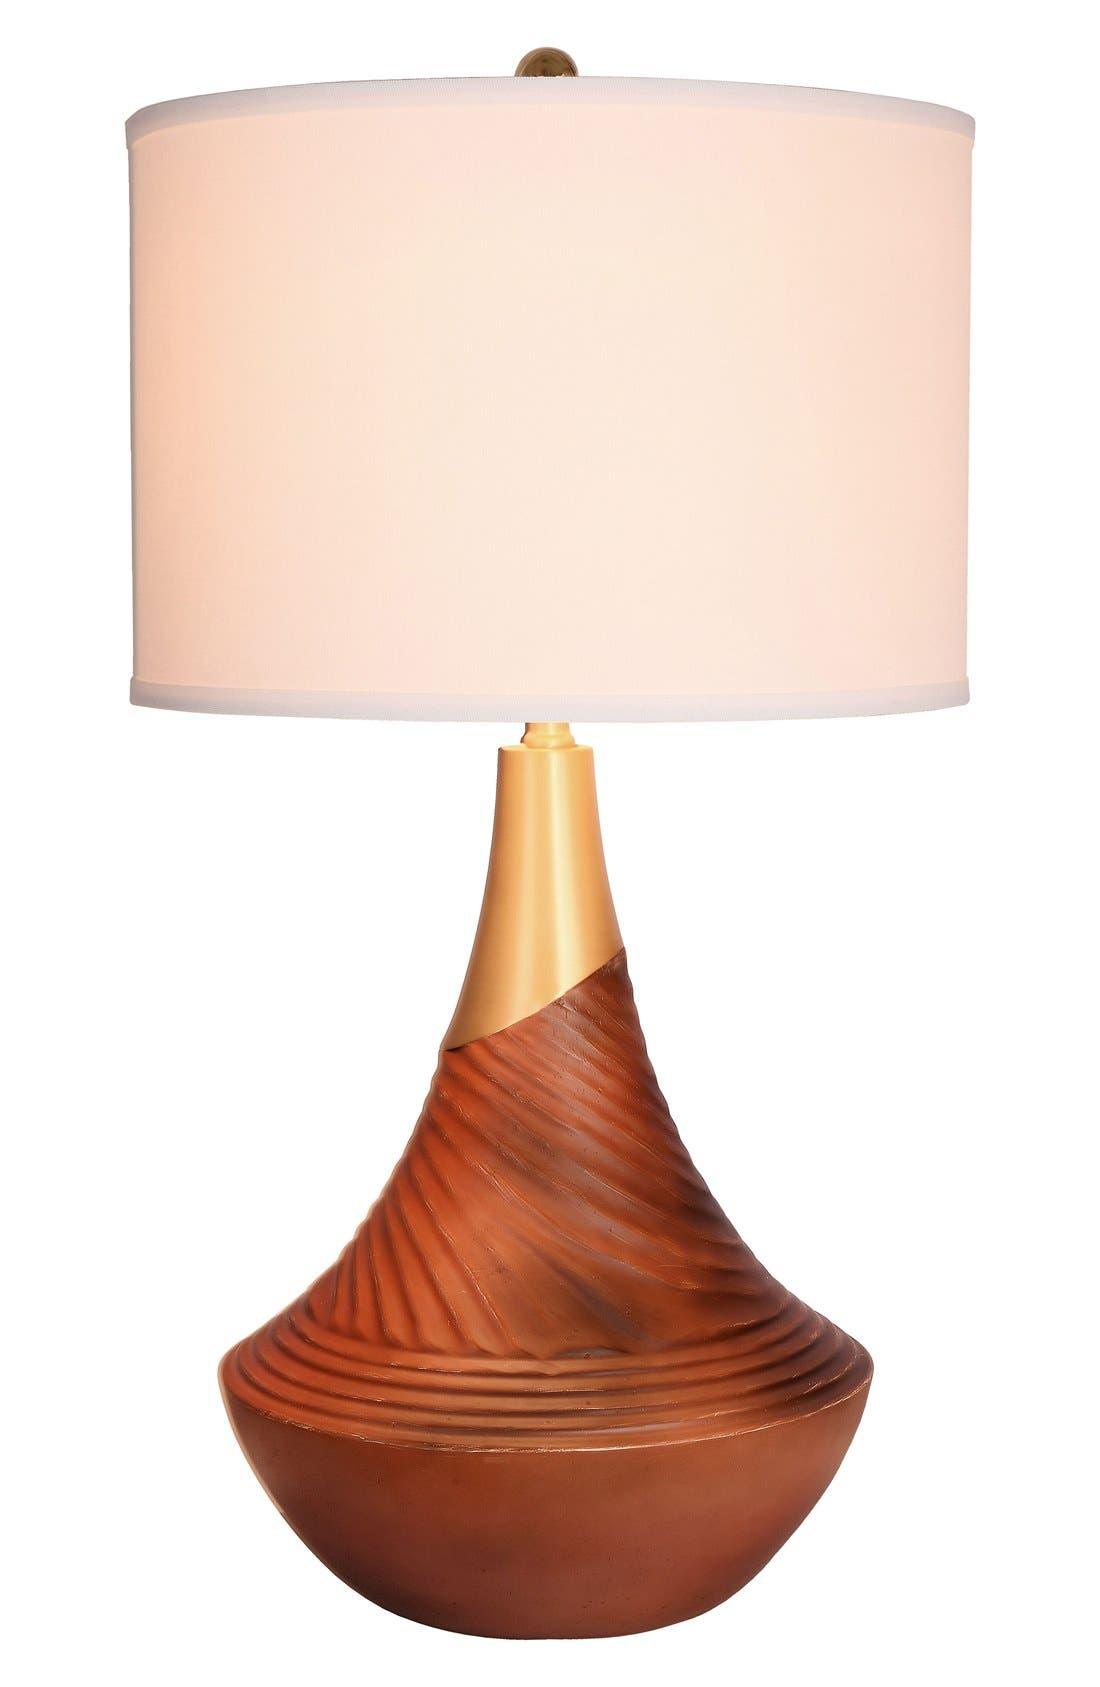 Alternate Image 1 Selected - JAlexander Cora Resin Table Lamp